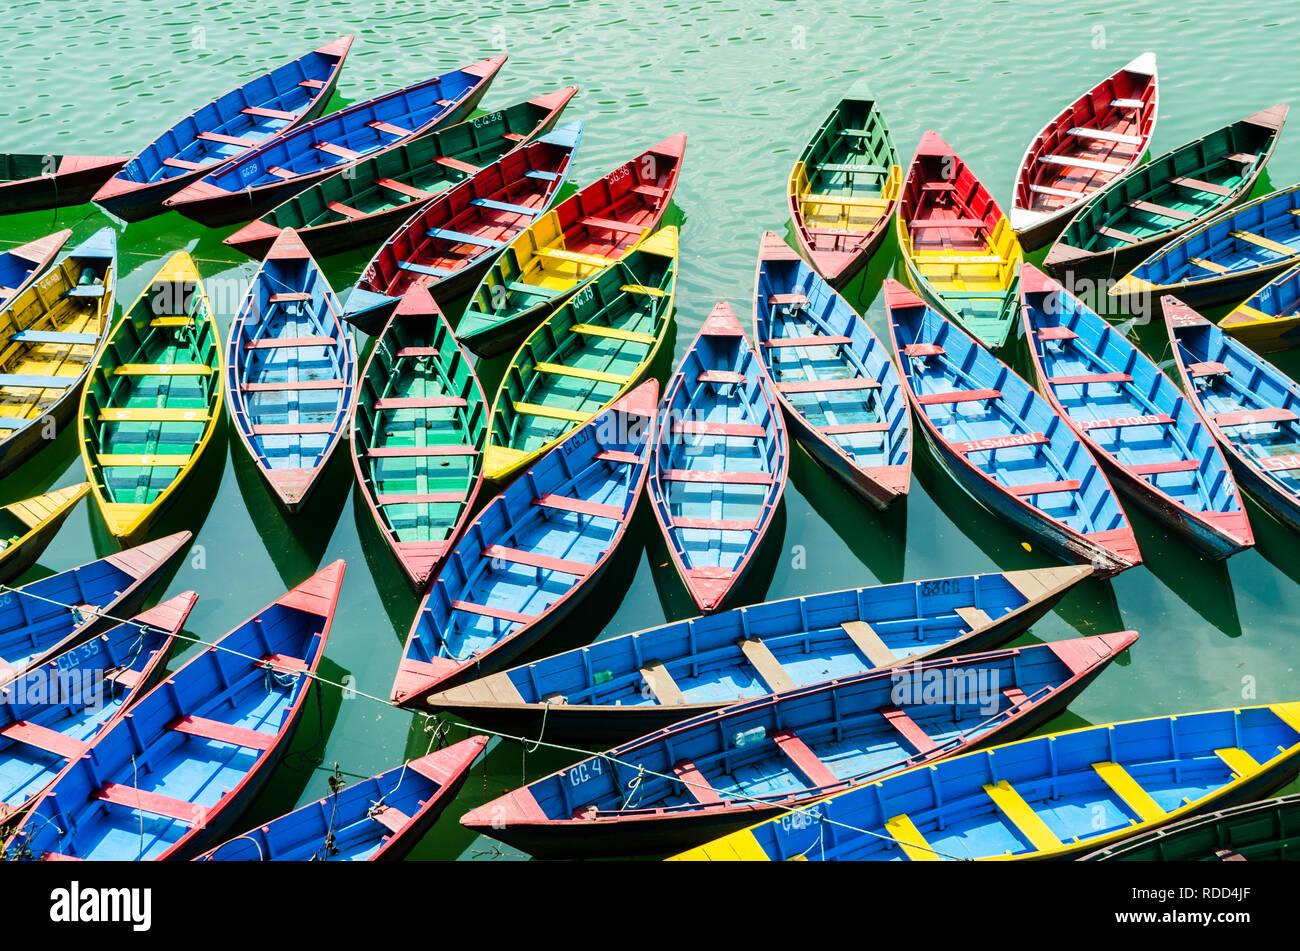 Colorful wooden boats in Phewa Lake, Pokhara, Nepal - Stock Image